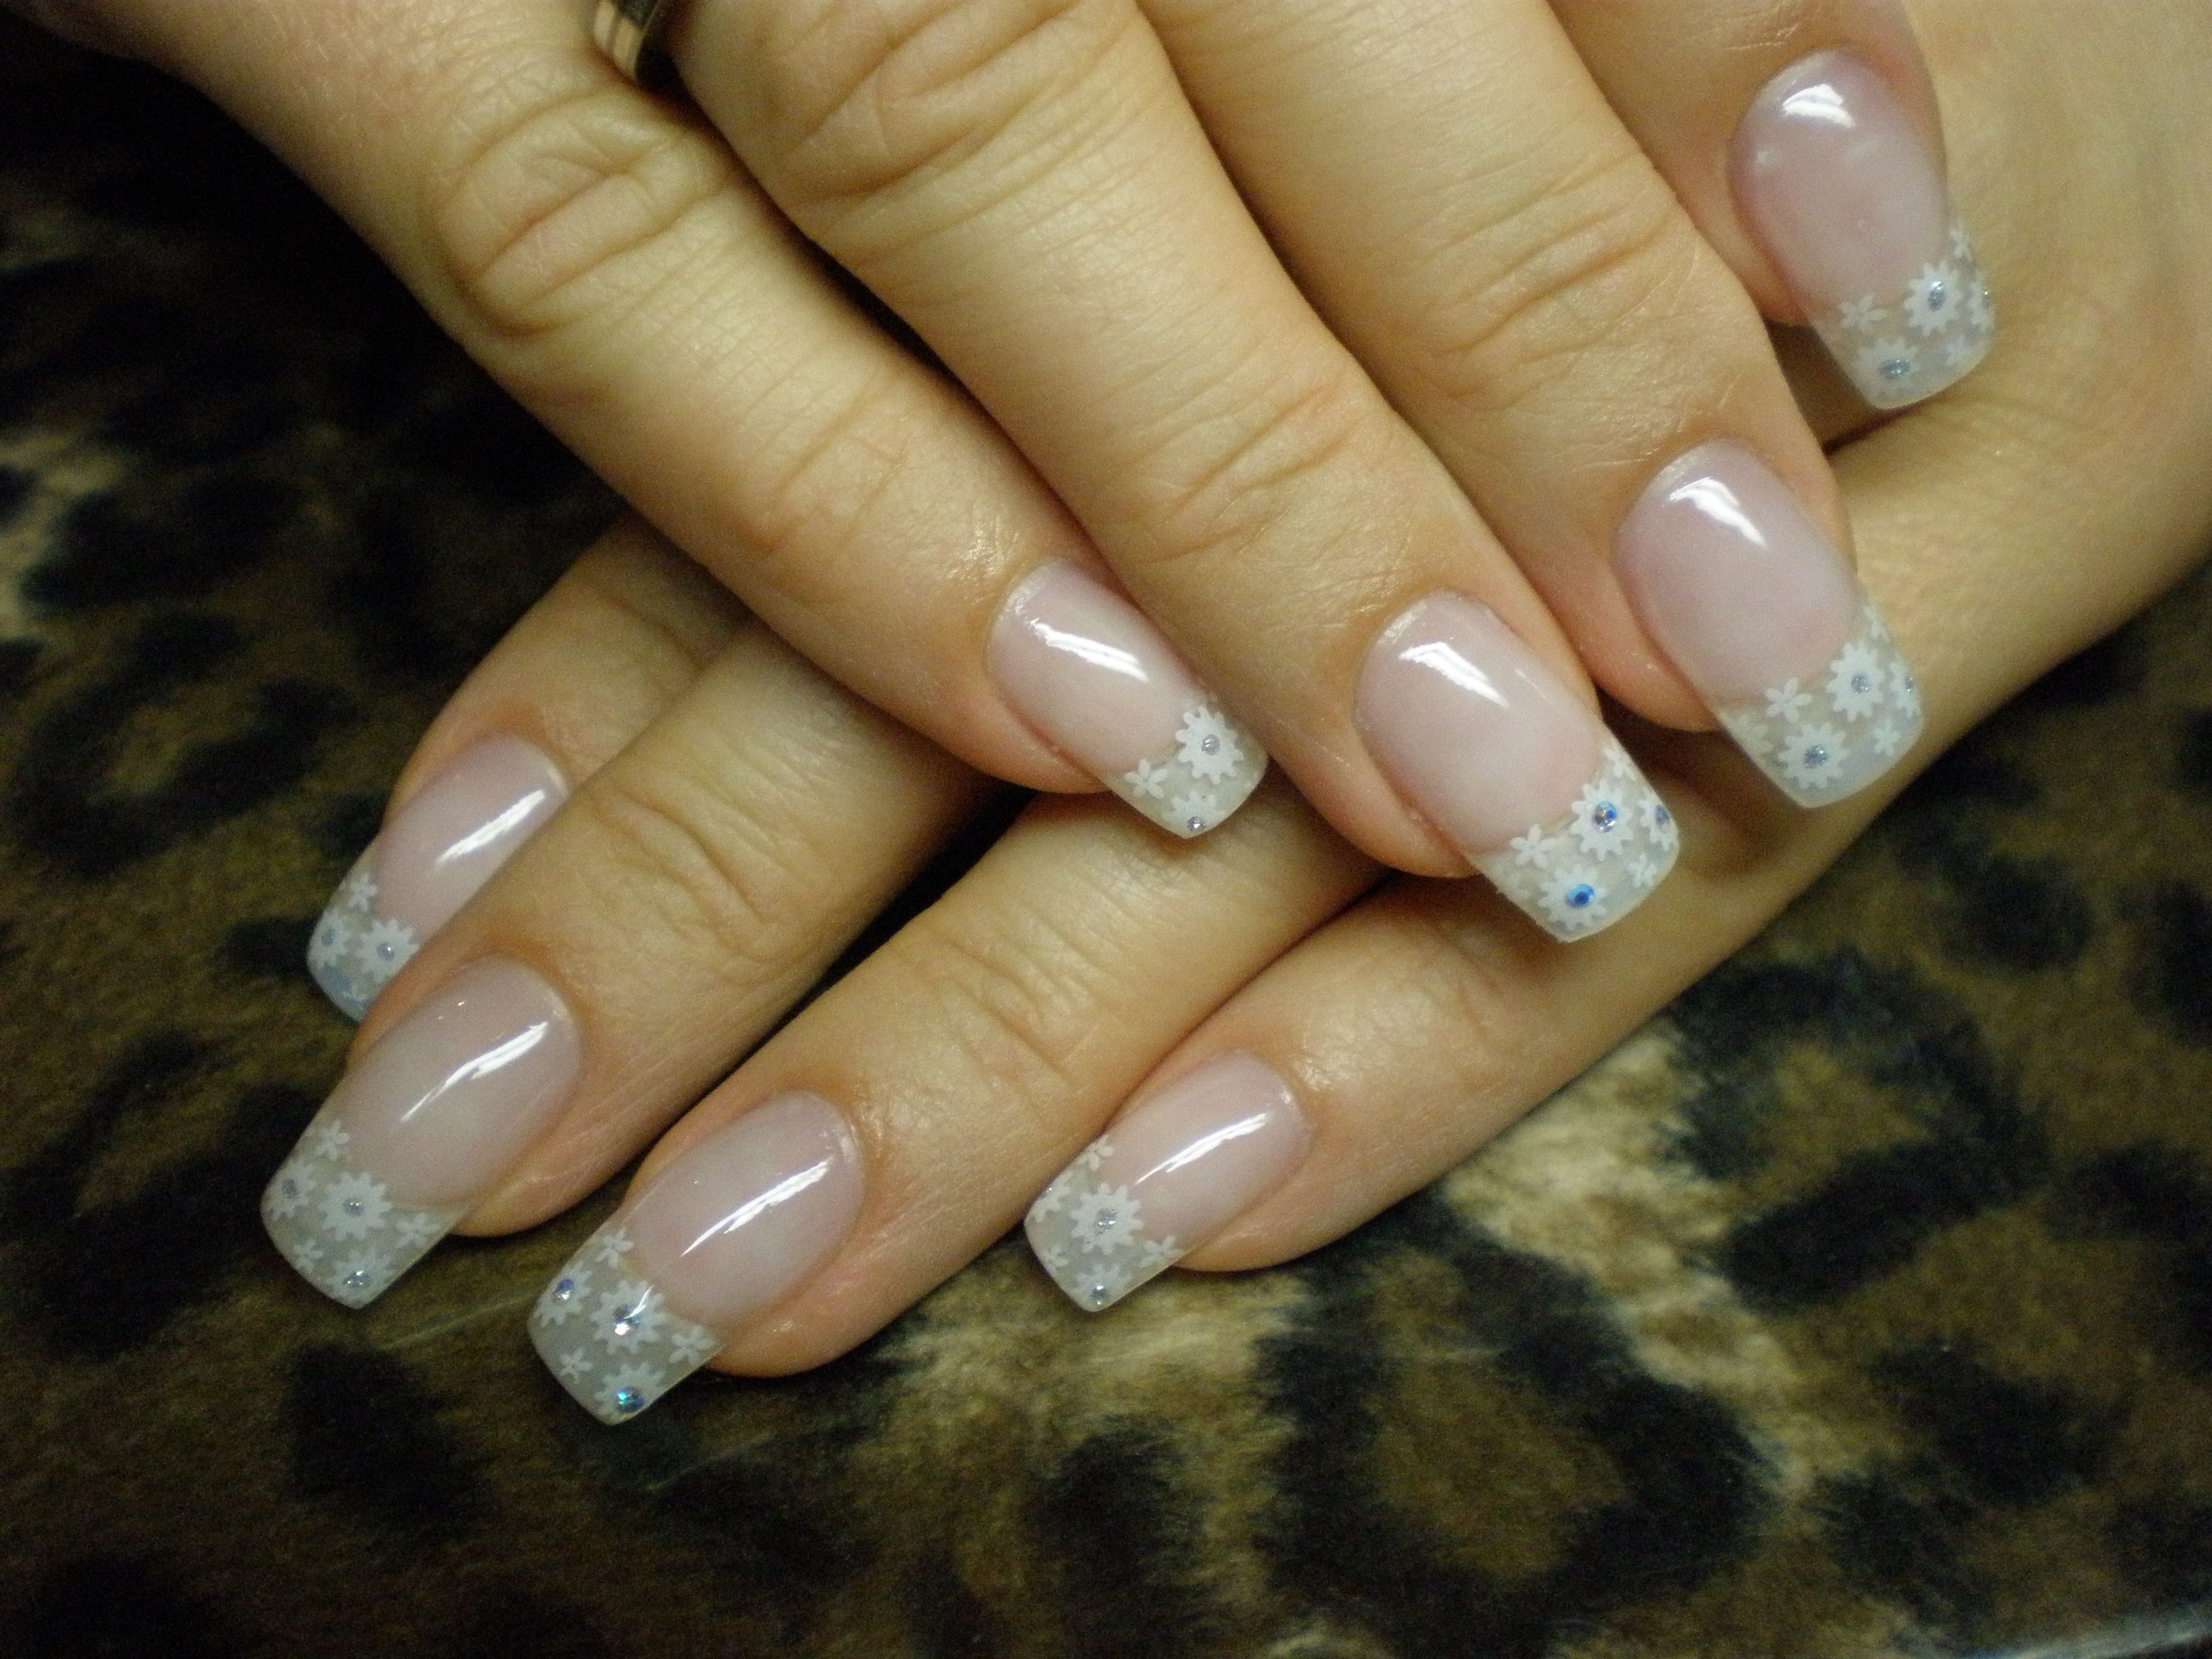 Pin by christine borlase on pretty nails designs pinterest